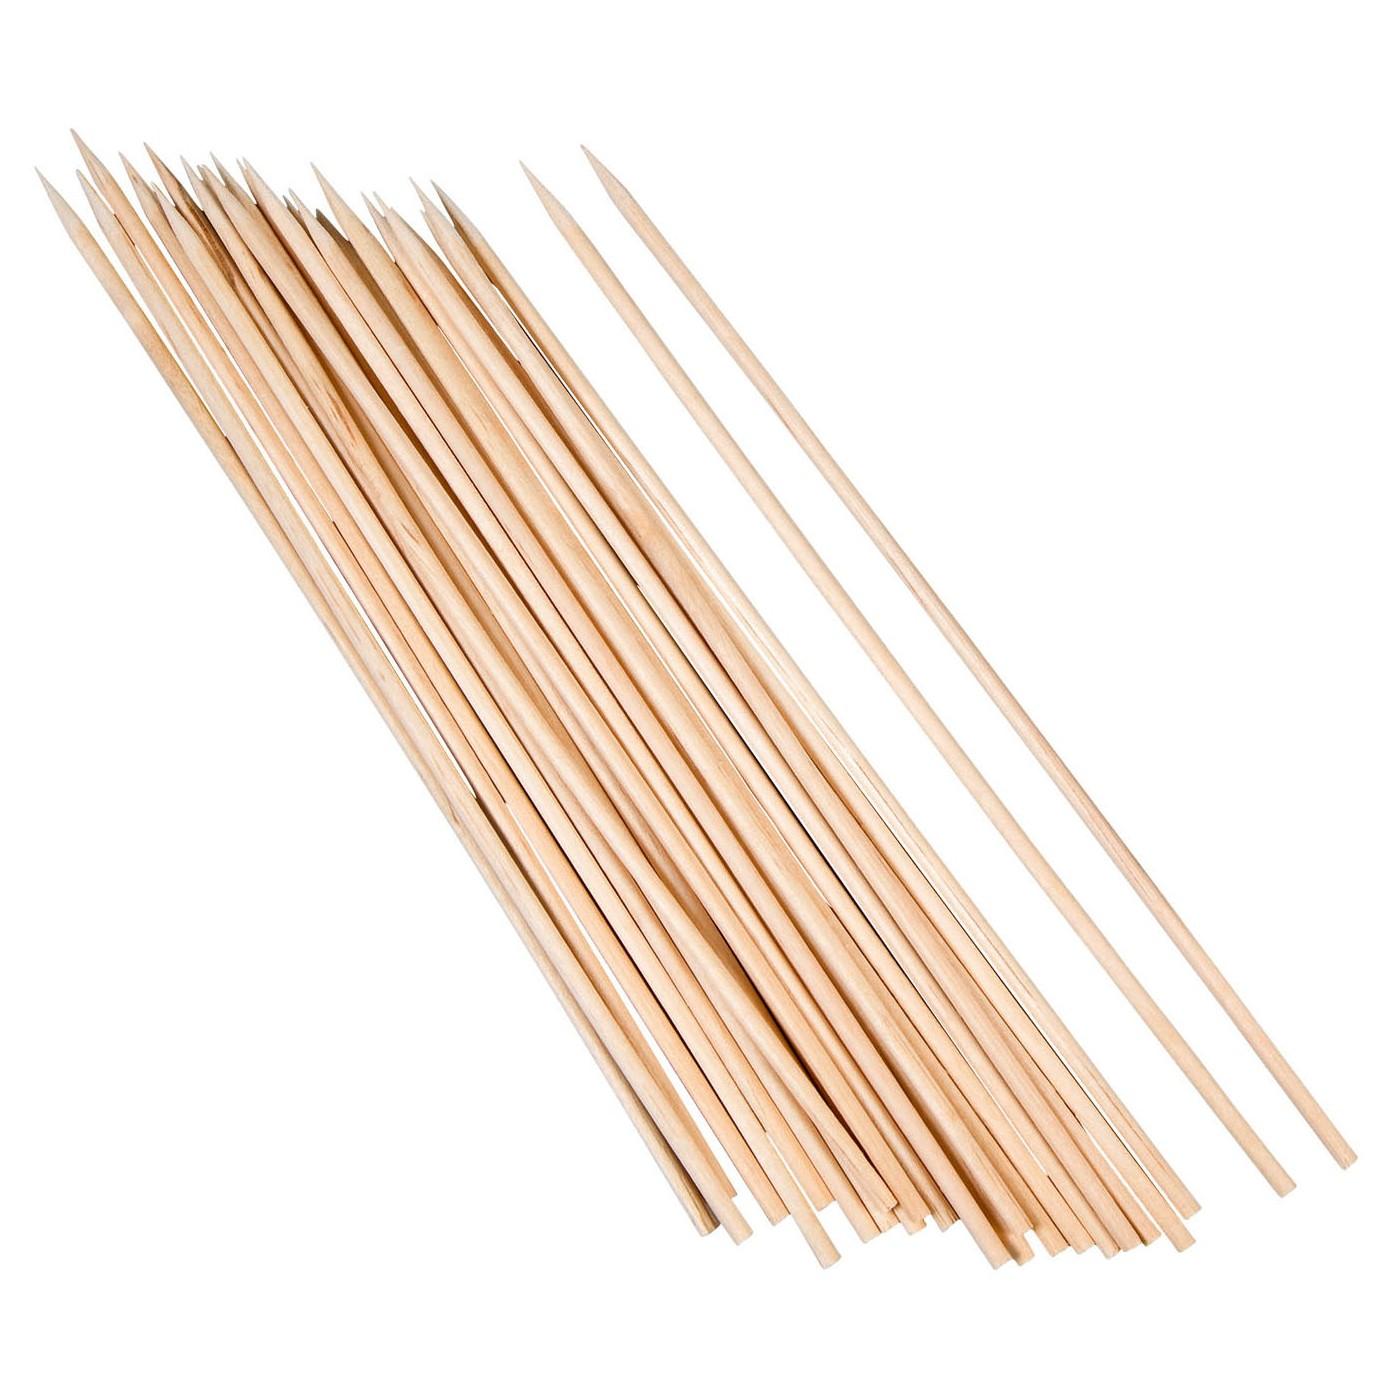 kögler schaschlik-stäbe aus holz, 20 cm, natur (25er pack) | ebay